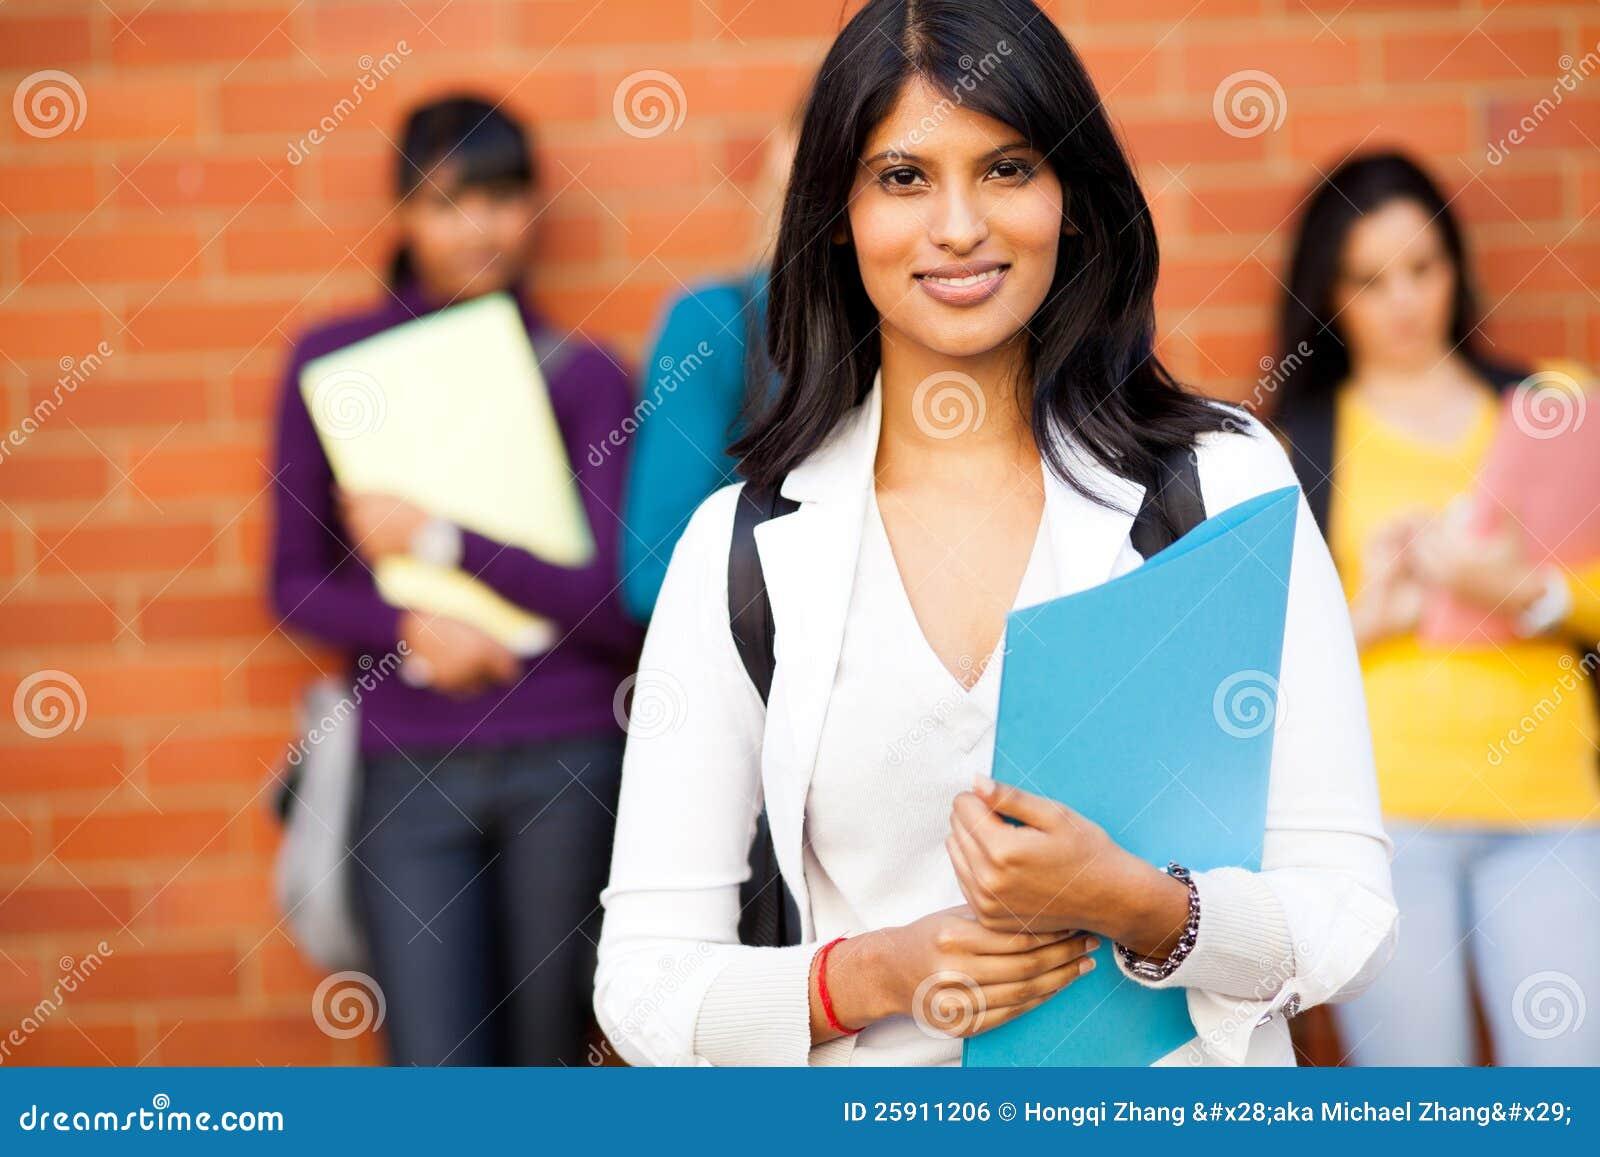 College-wide Study Abroad Grants